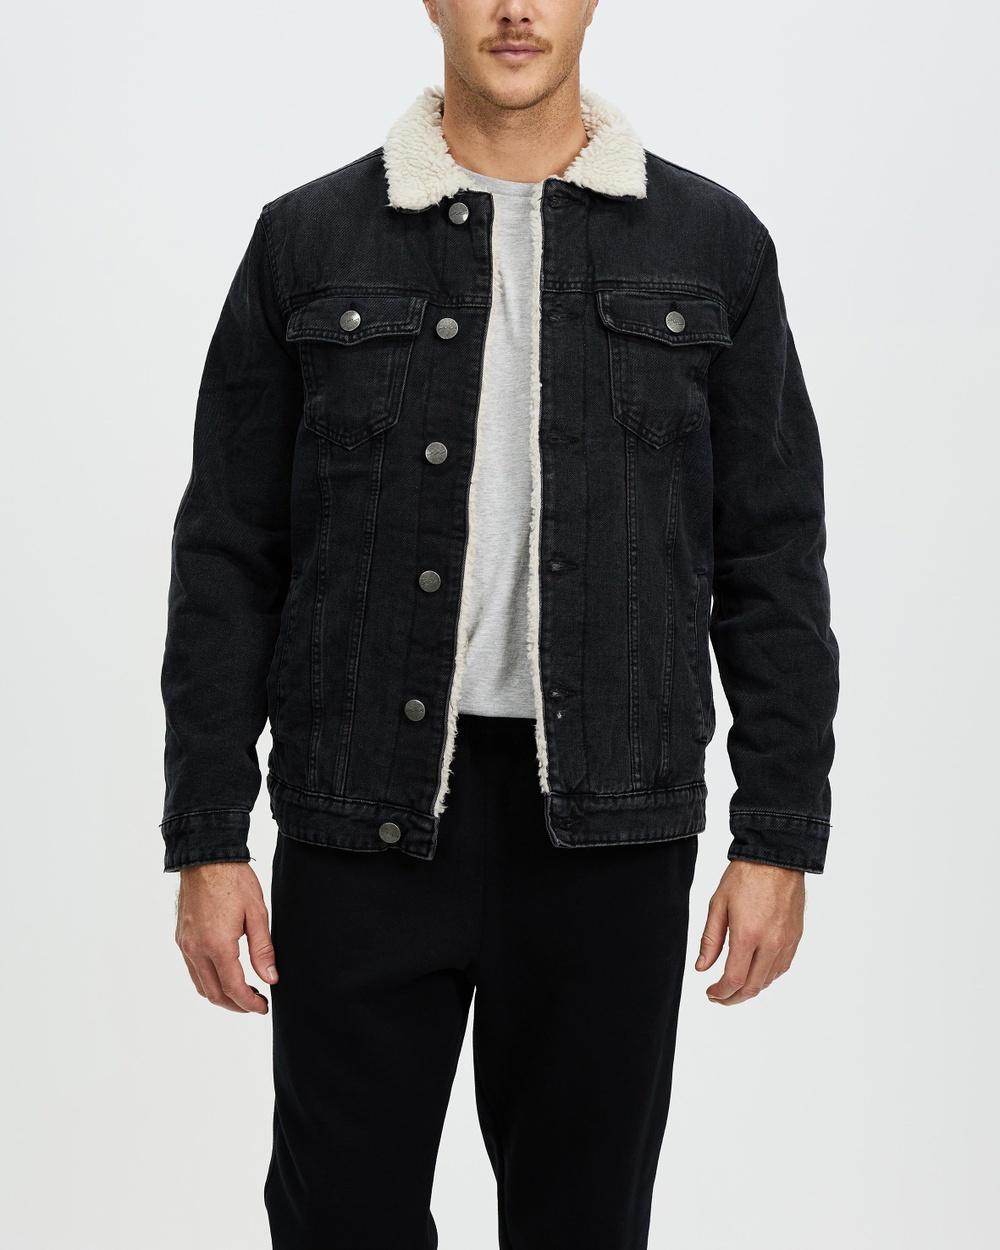 Factorie Denim Sherpa Jacket jacket Washed Black Australia